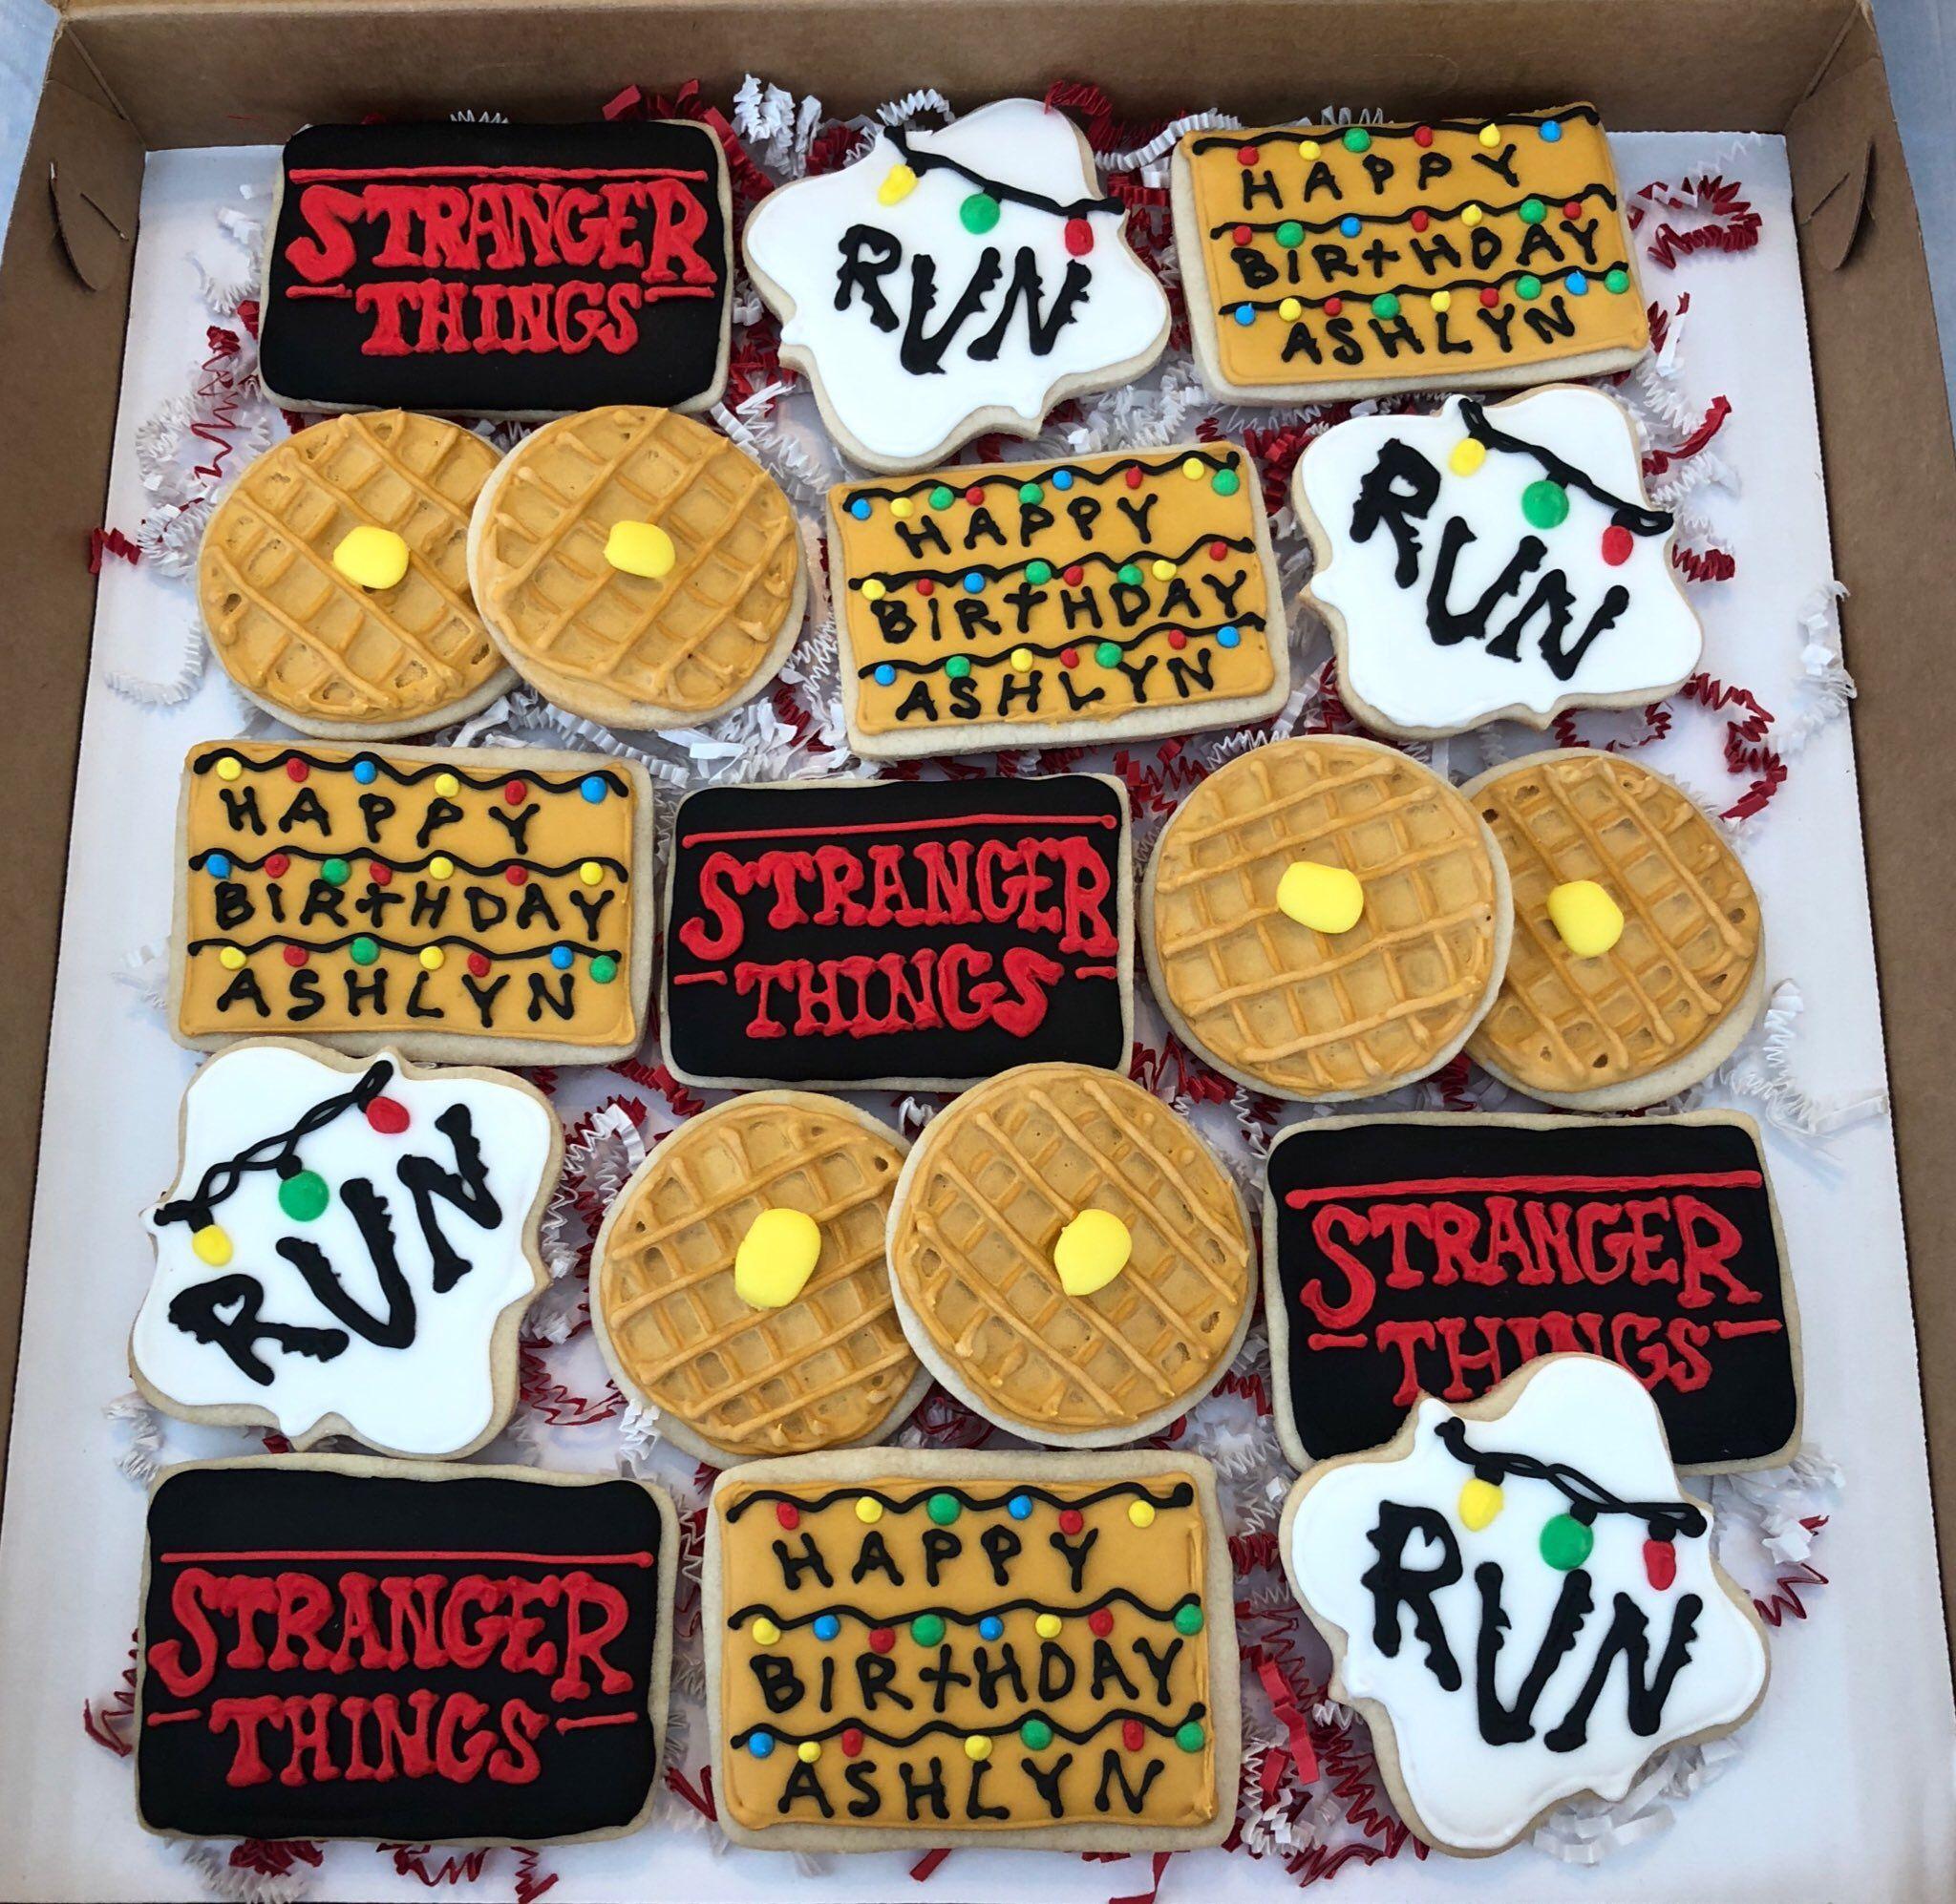 Stranger Things Theme For A Birthday Celebration I Had